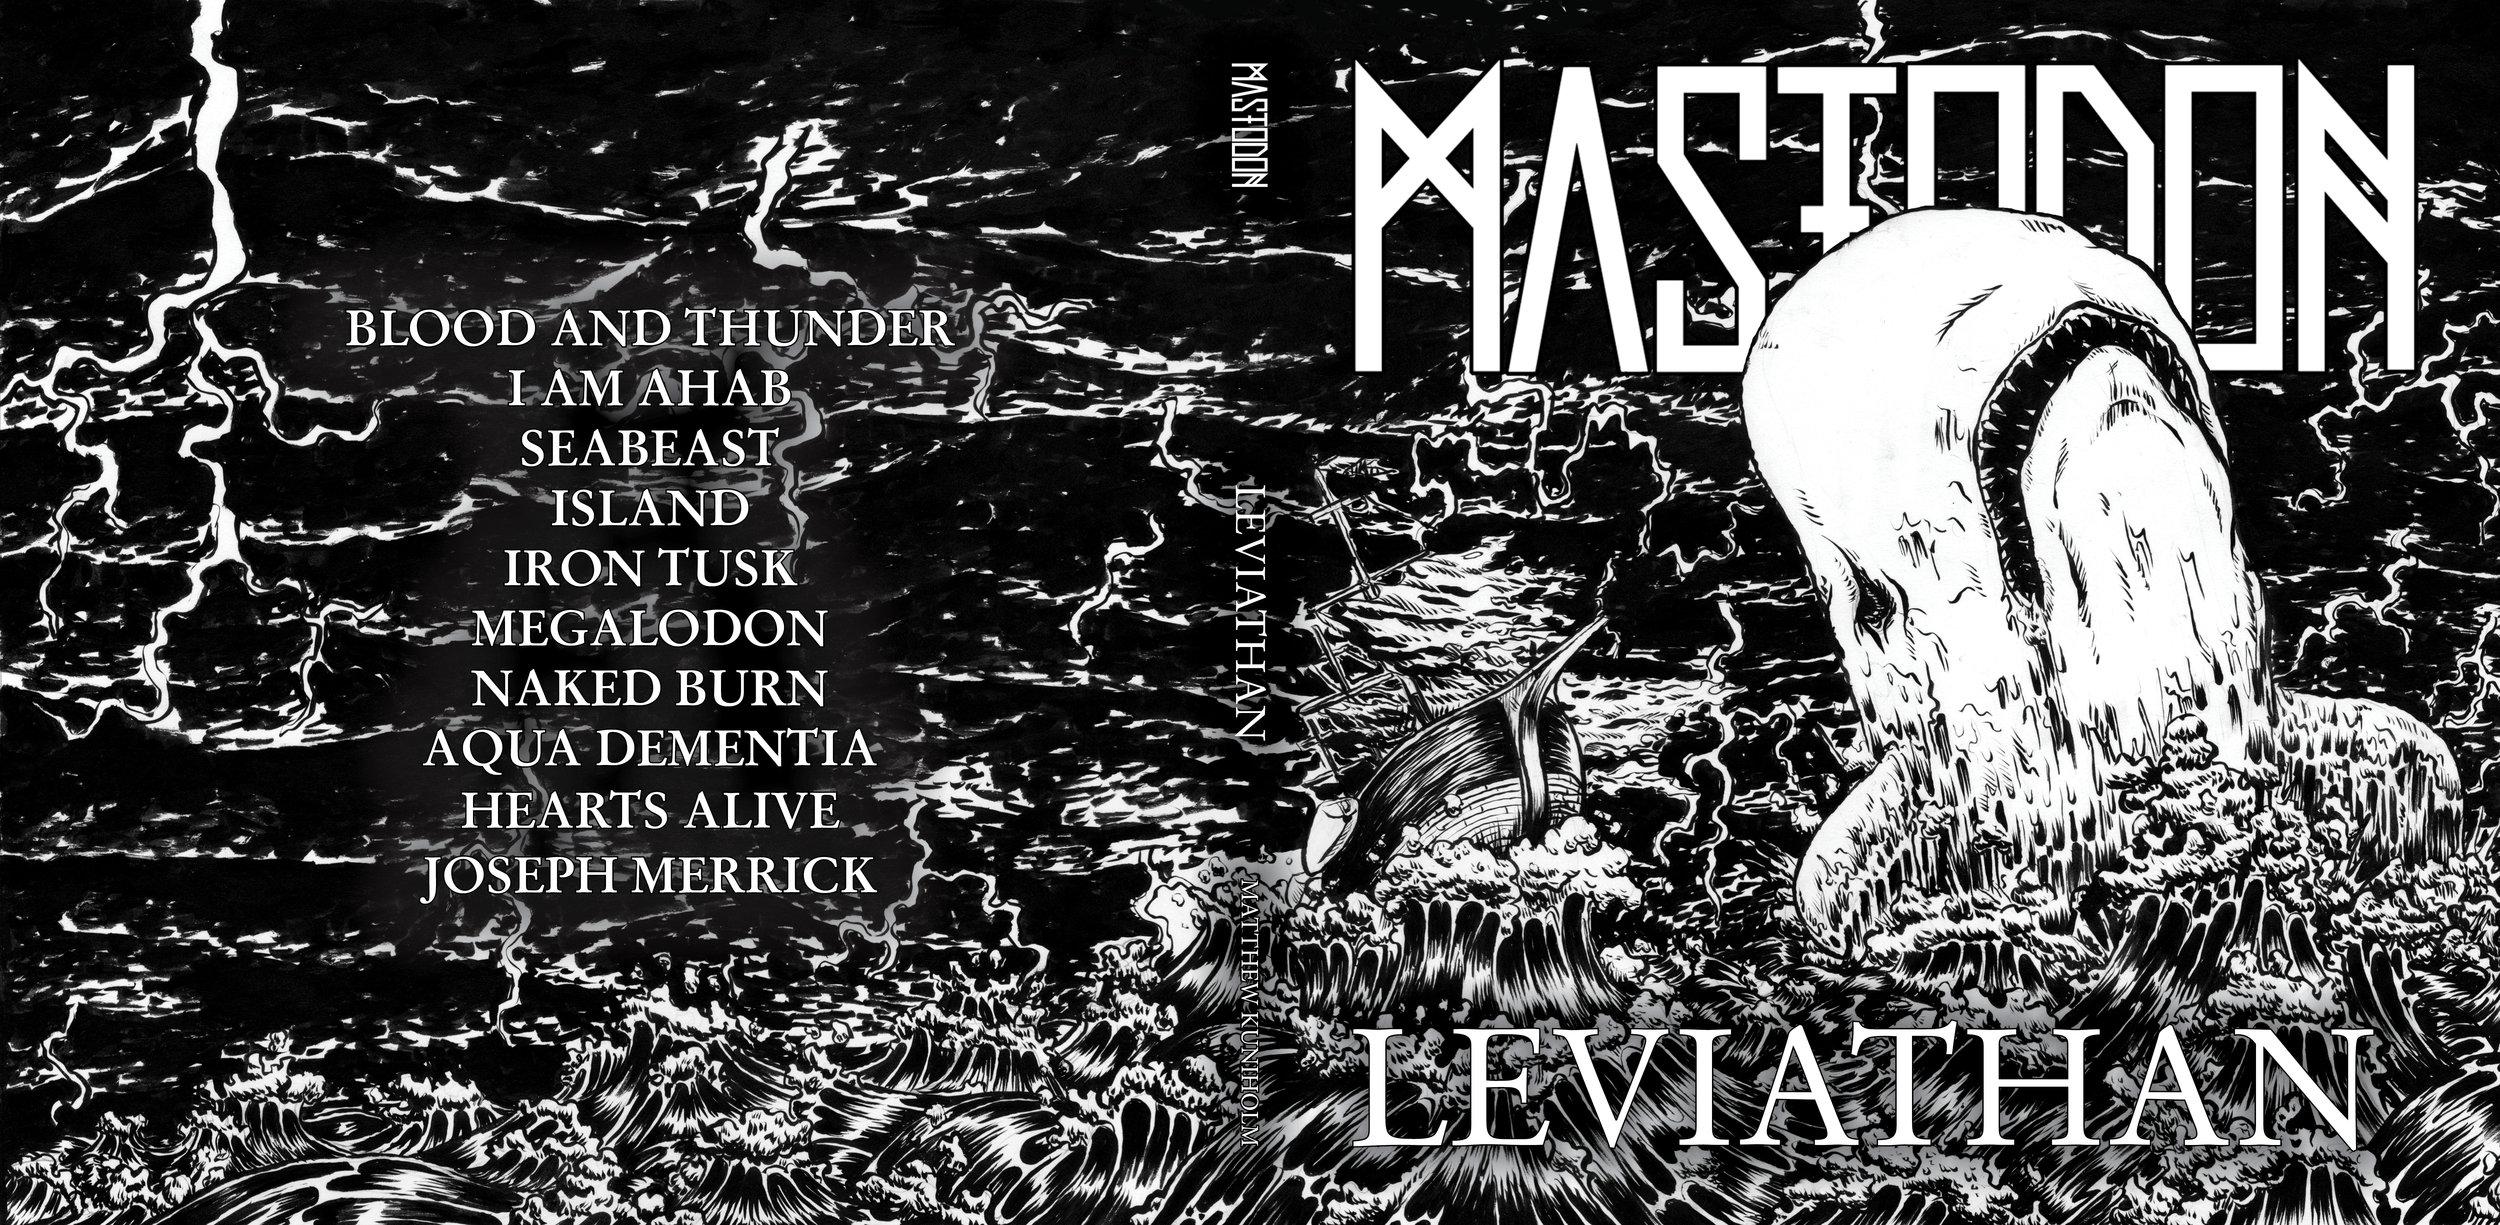 MASTODON_ALBUM_ART_FINAL.jpg